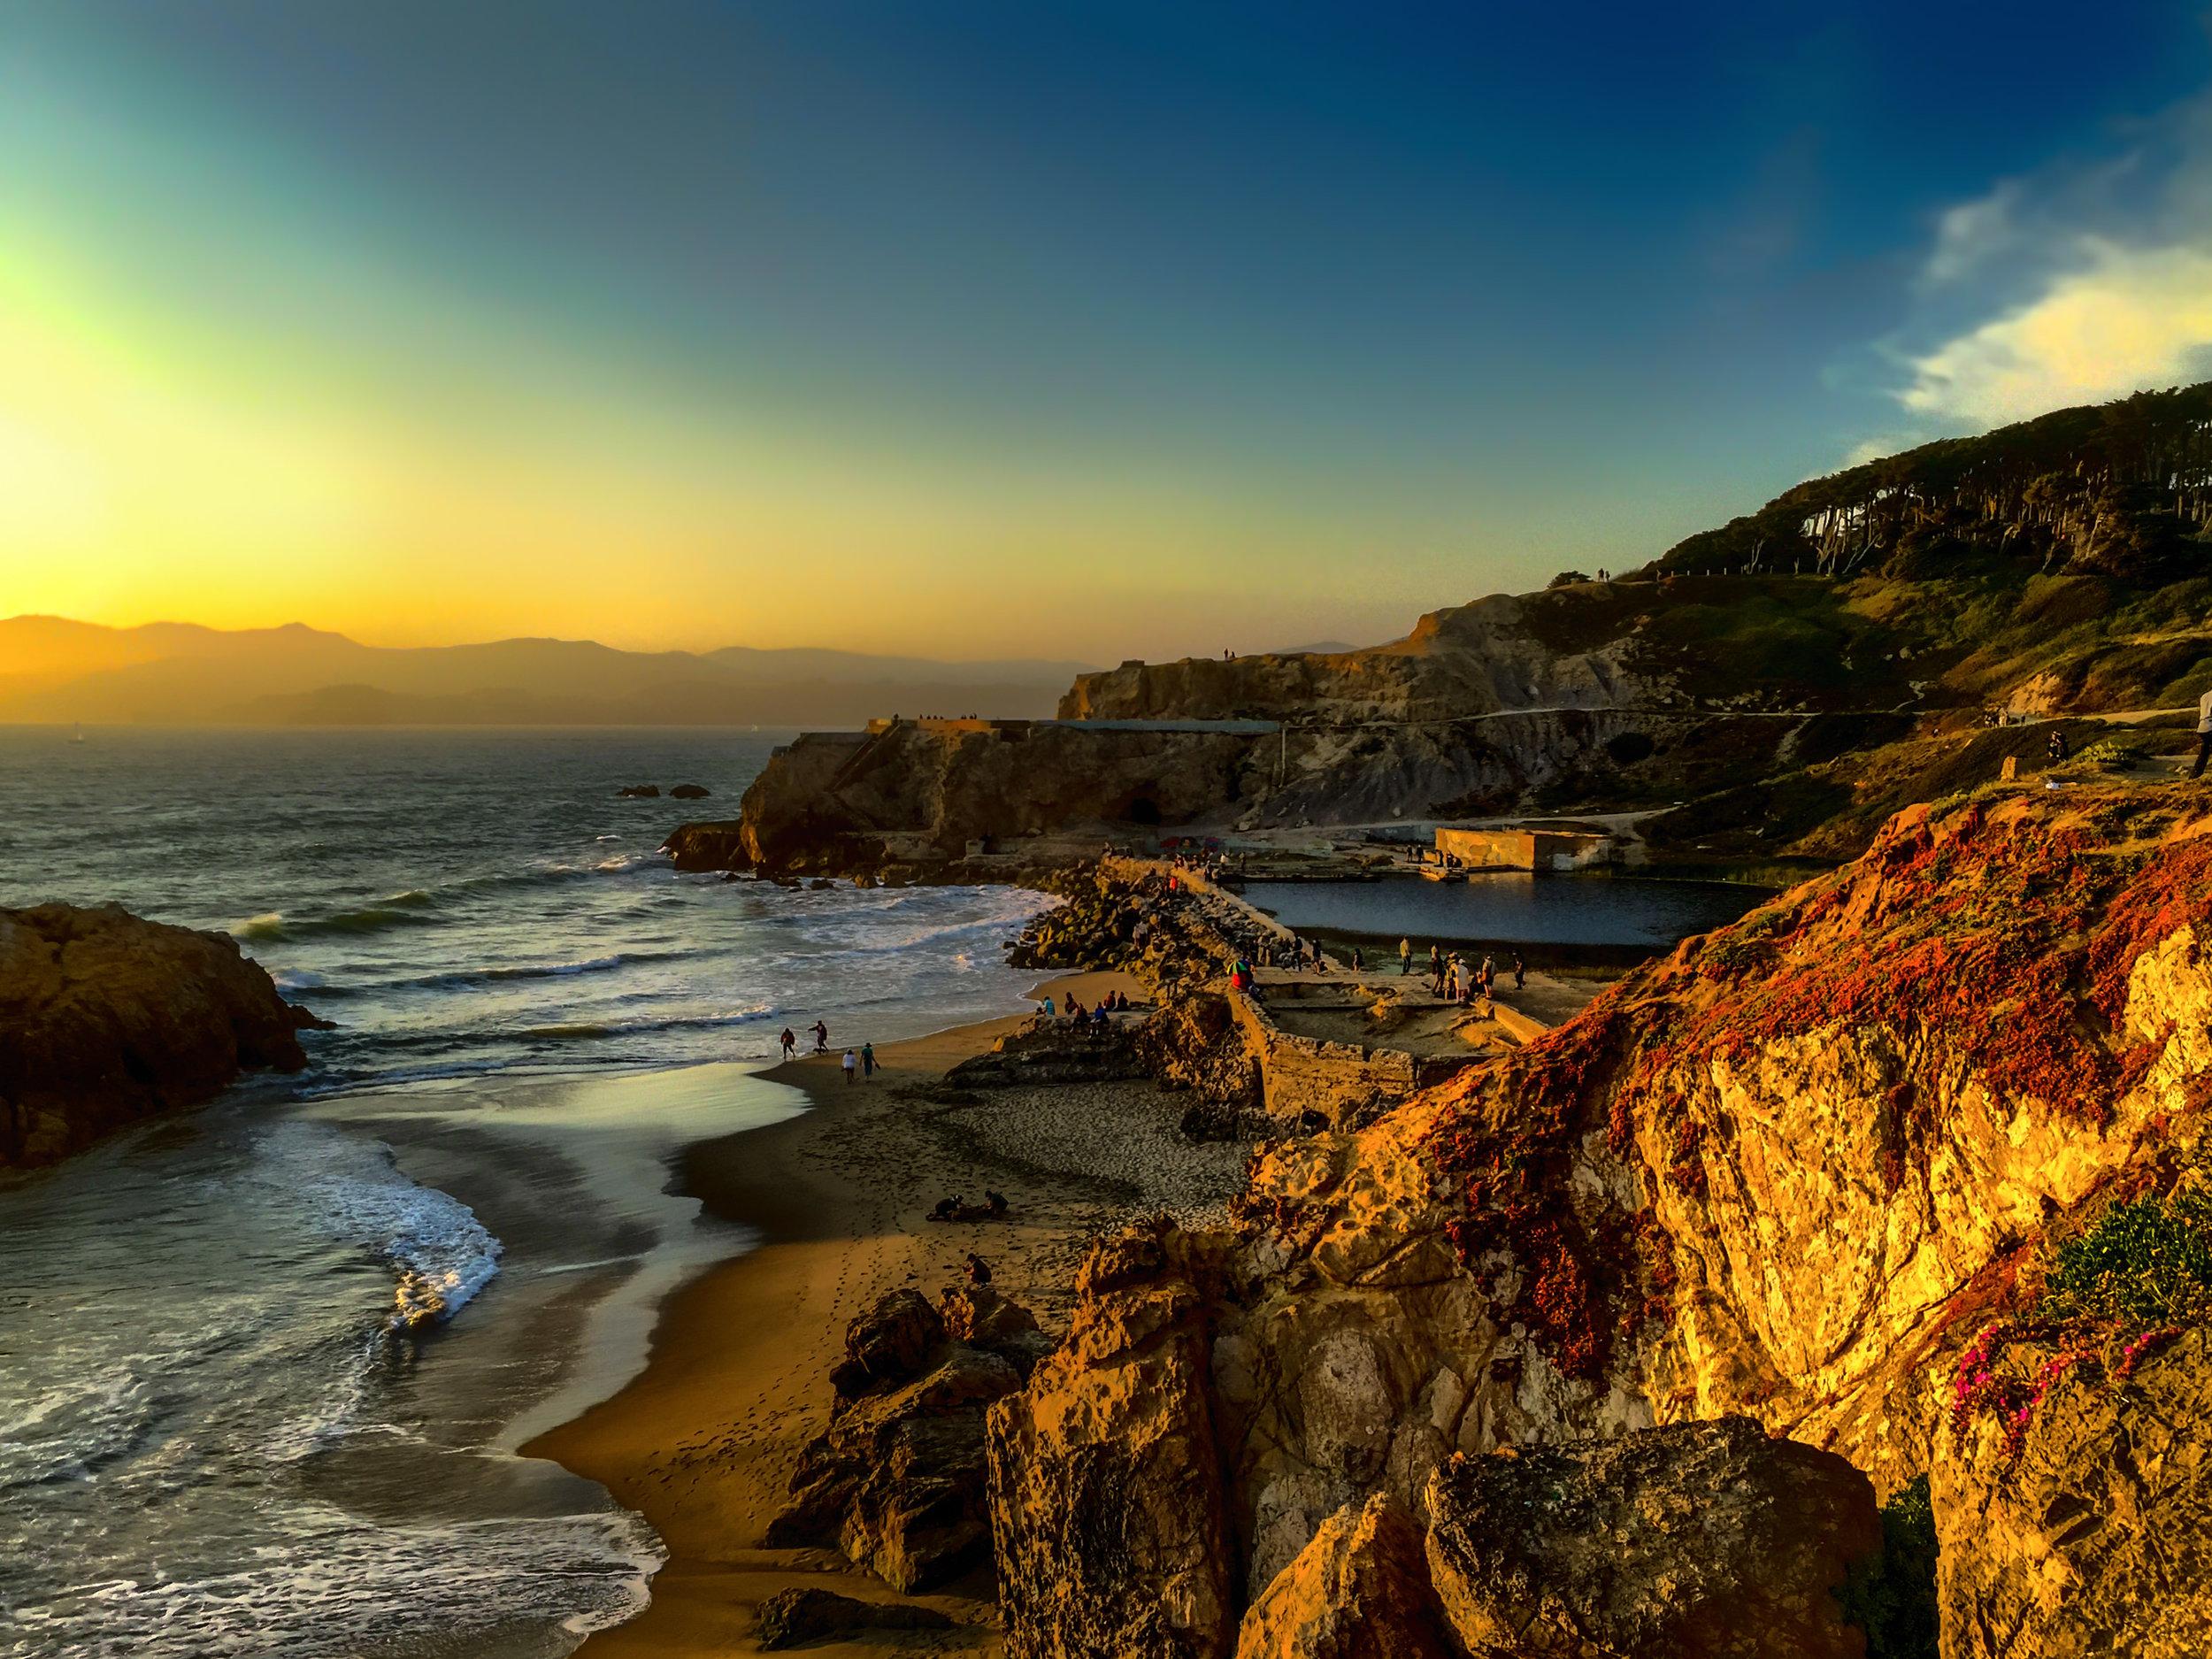 Point Lobos, San Francisco